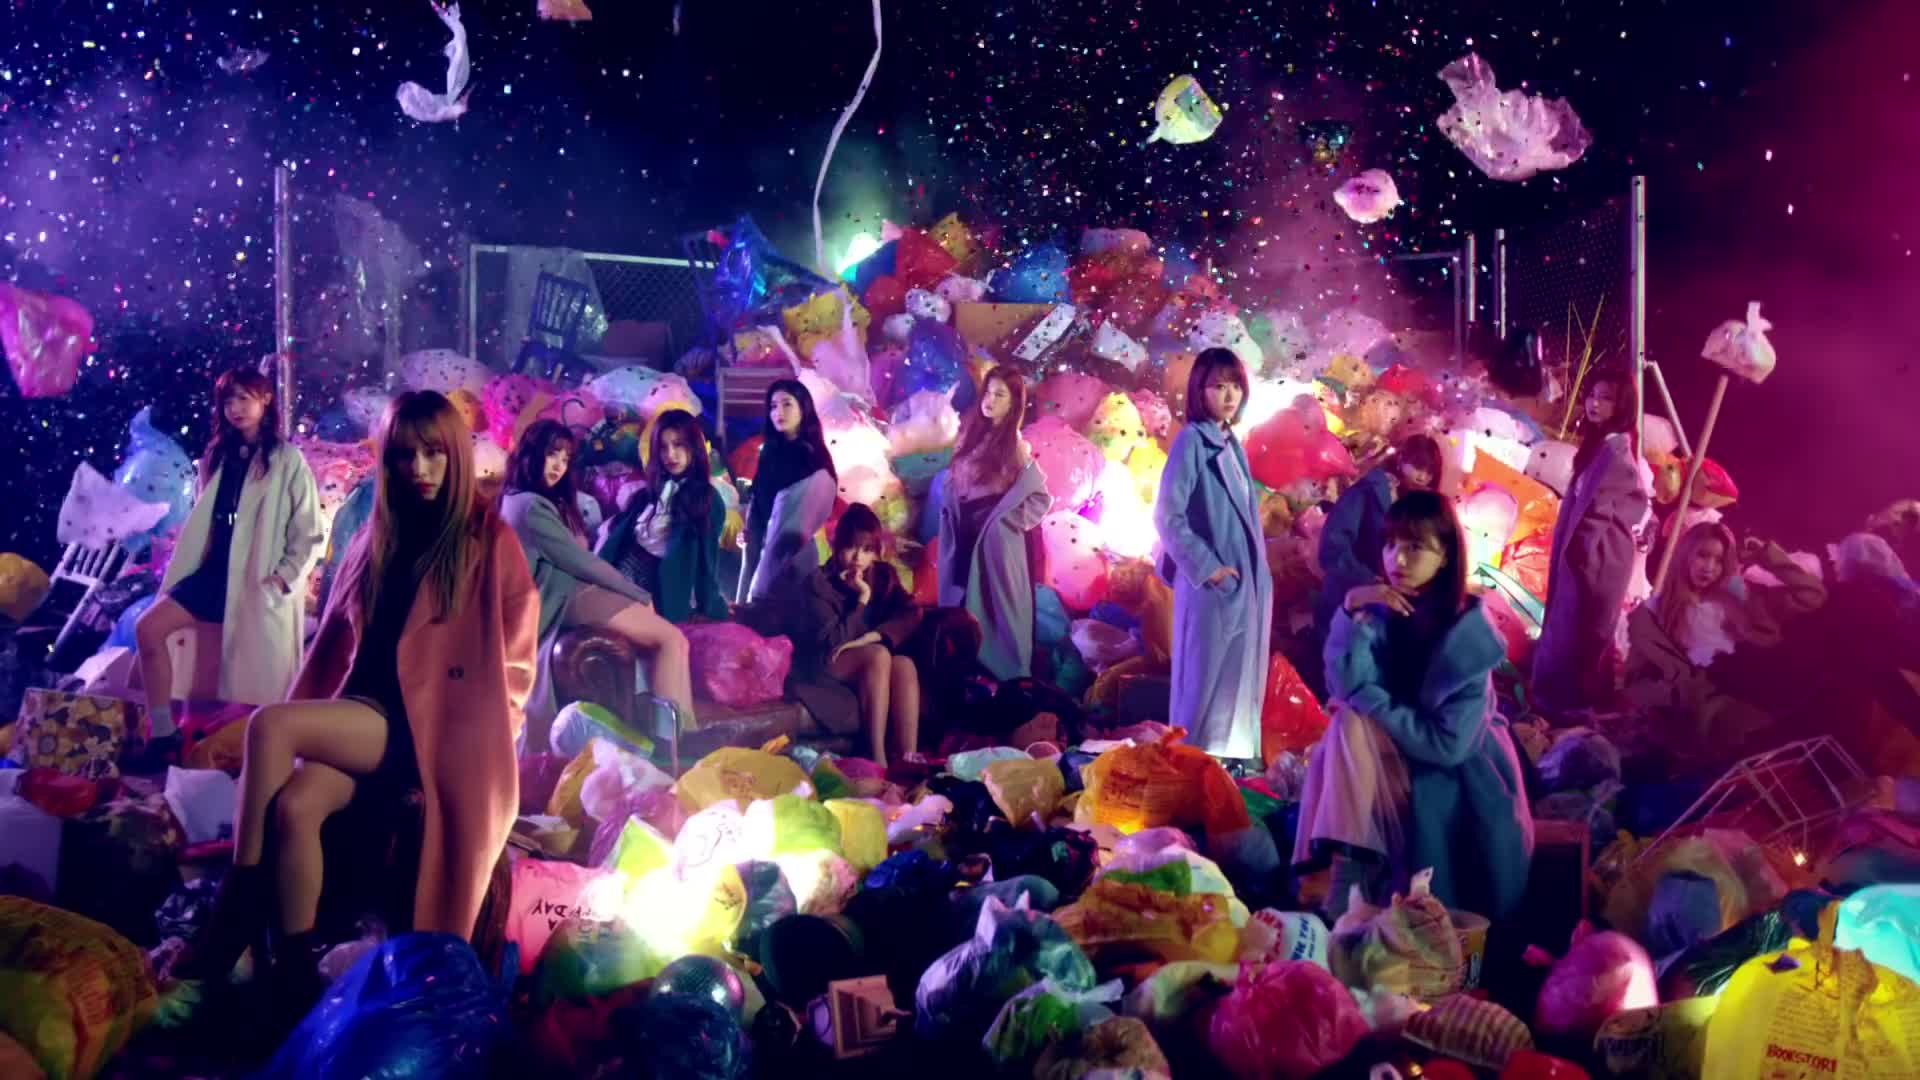 an yu jin, choi ye na, iz one, iz*one, jang won young, jo yu ri, miyawaki sakura, produce48, yabuki nako, アイズワン, プロデュース フォーティーエイト, 宮脇 咲良, 미야와키 사쿠라, 아이즈원, 안유진, 야부키 나코, 장원영, 조유리, 최예나, 프로듀스48, IZ*ONE (아이즈원) - '好きと言わせたい (Suki to Iwasetai)' MV GIFs